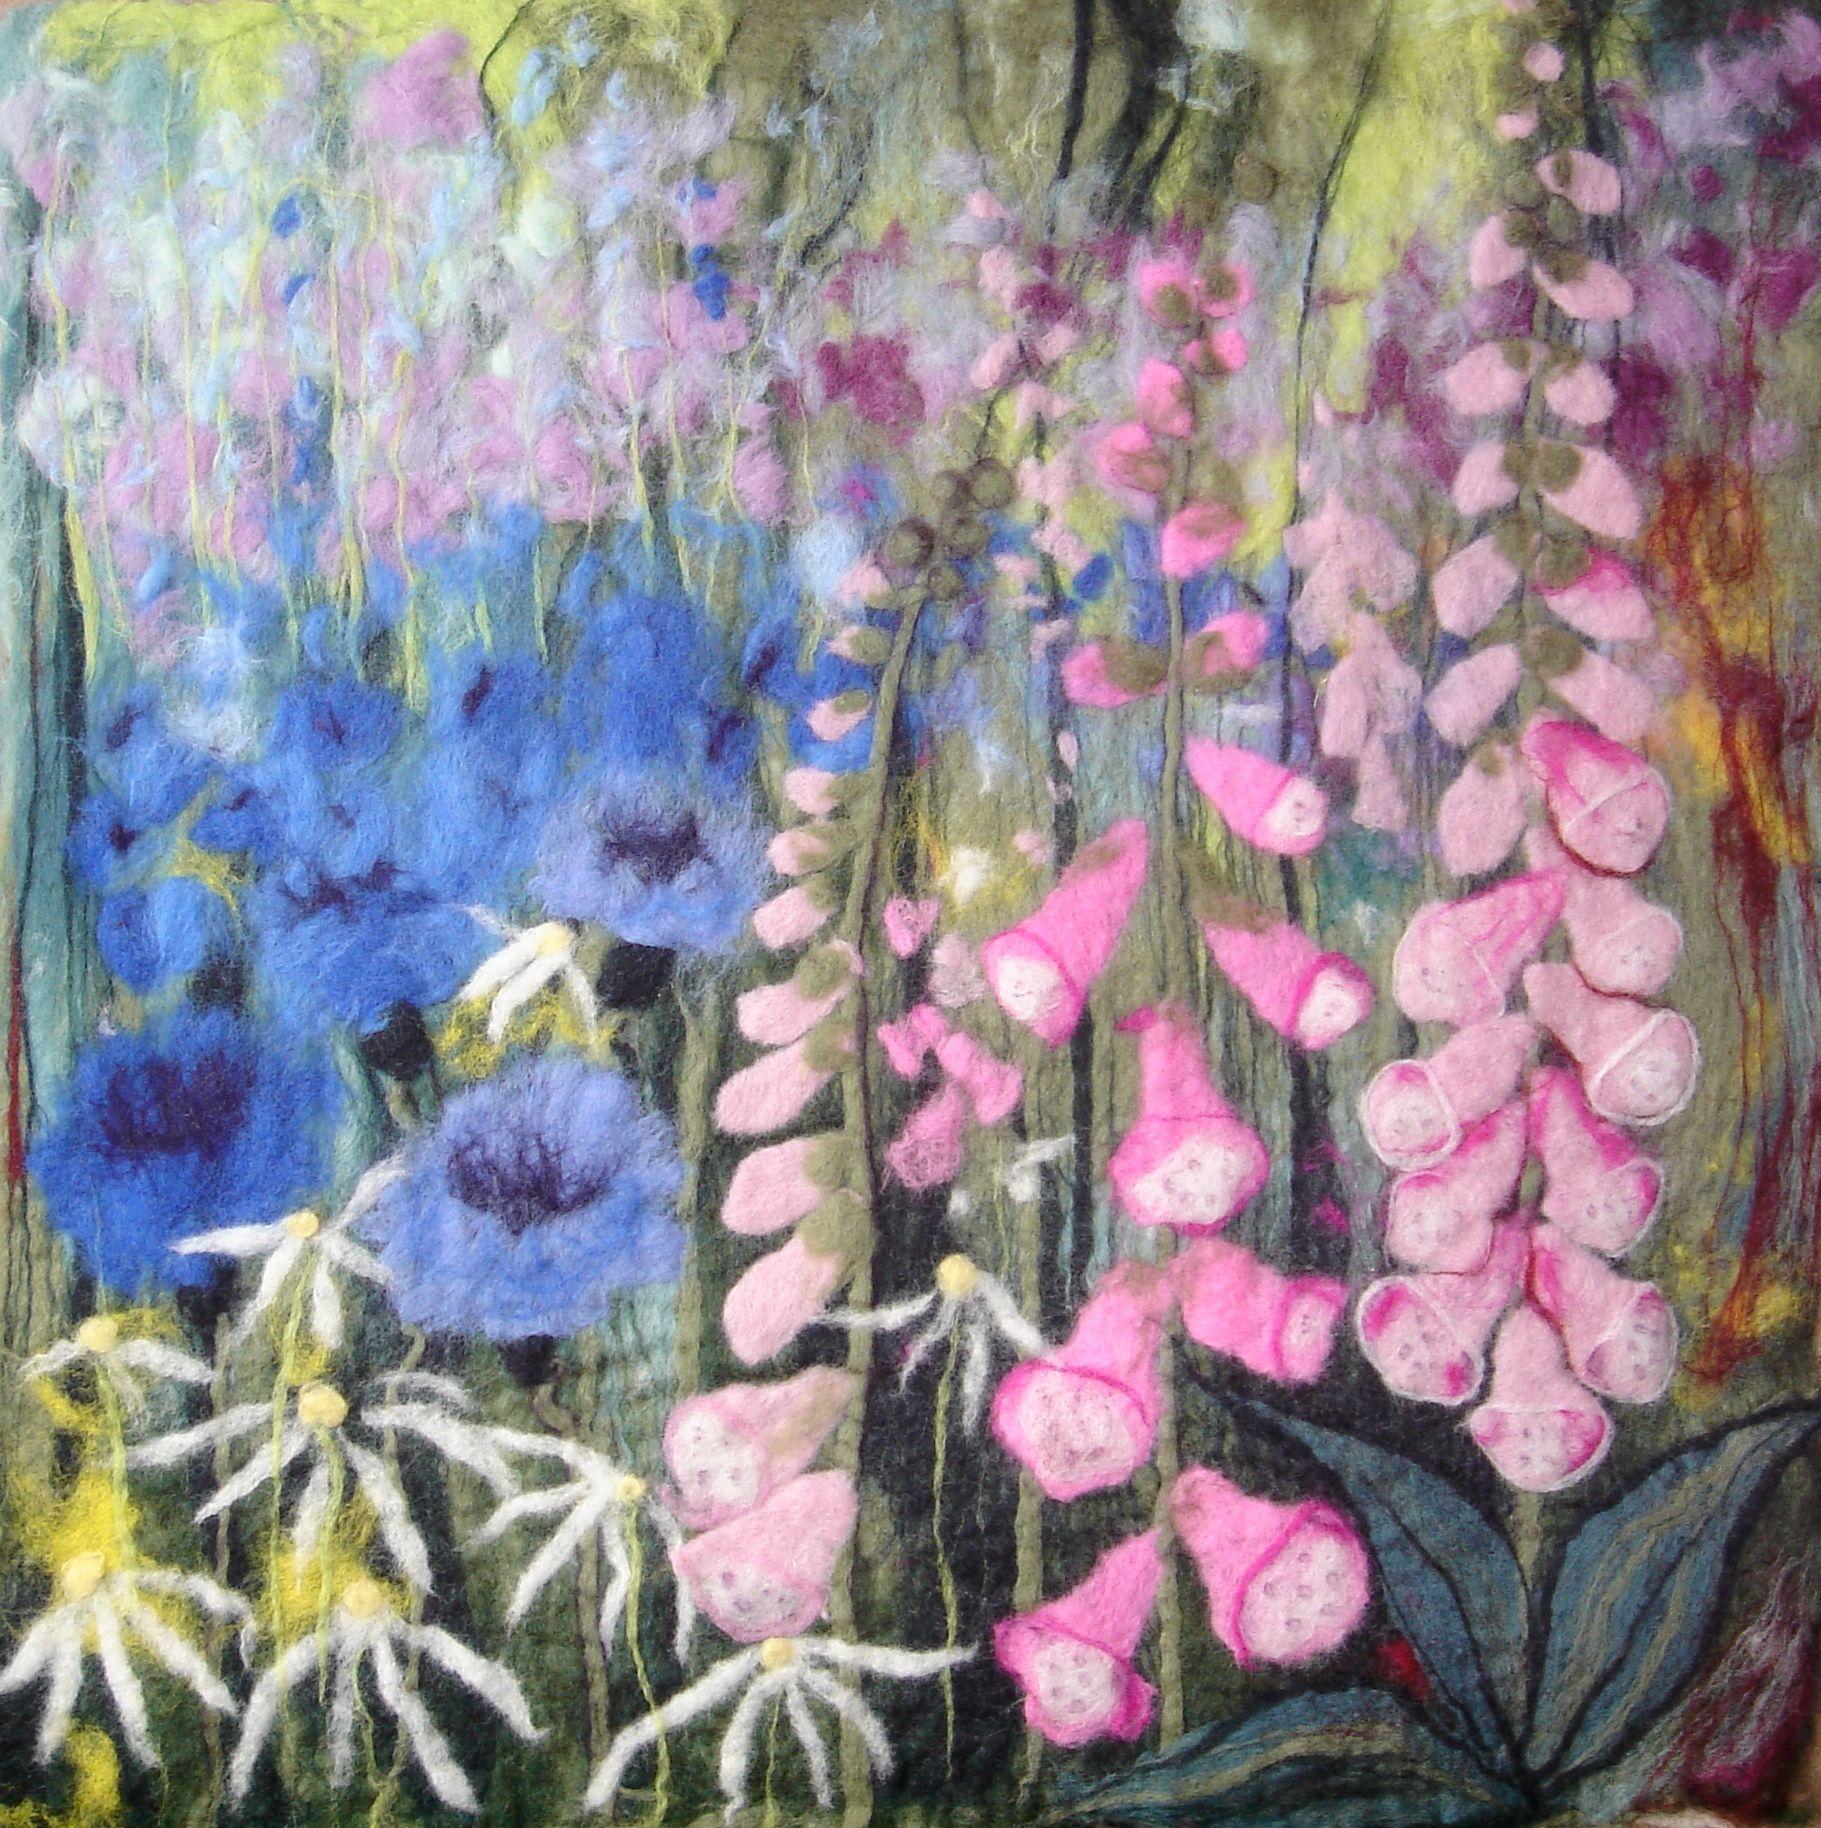 Liz Emery Felt Artist Http Www Lizemeryfelt Com Gallery Php